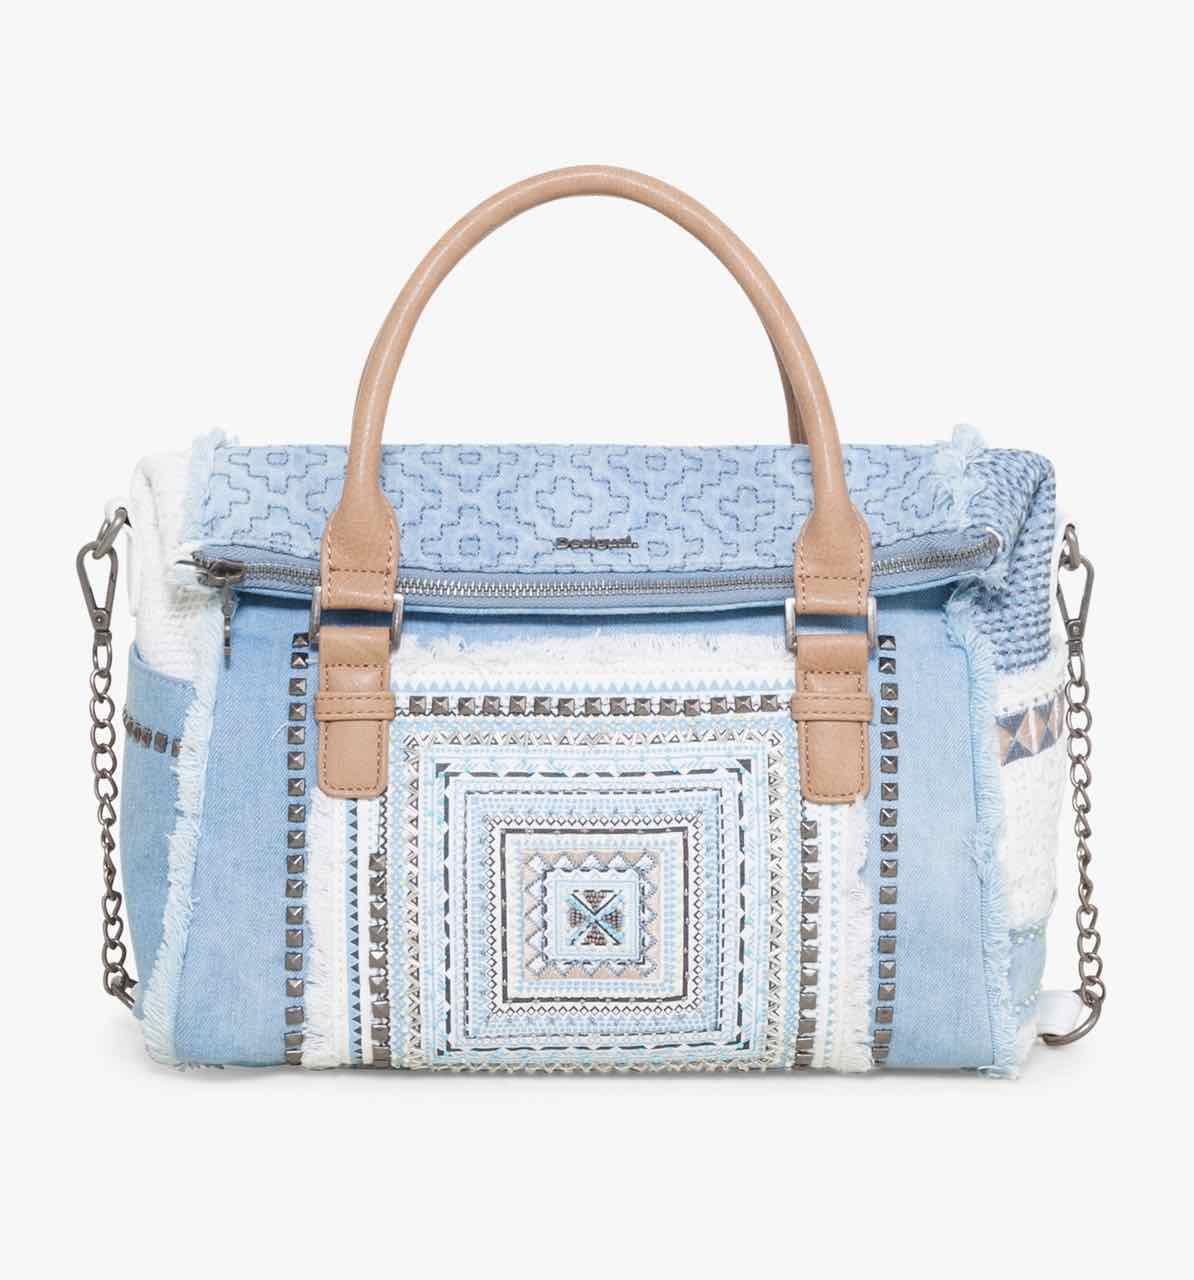 74X9JE6_5002 Desigual Bag Loverty Whitney Buy Online